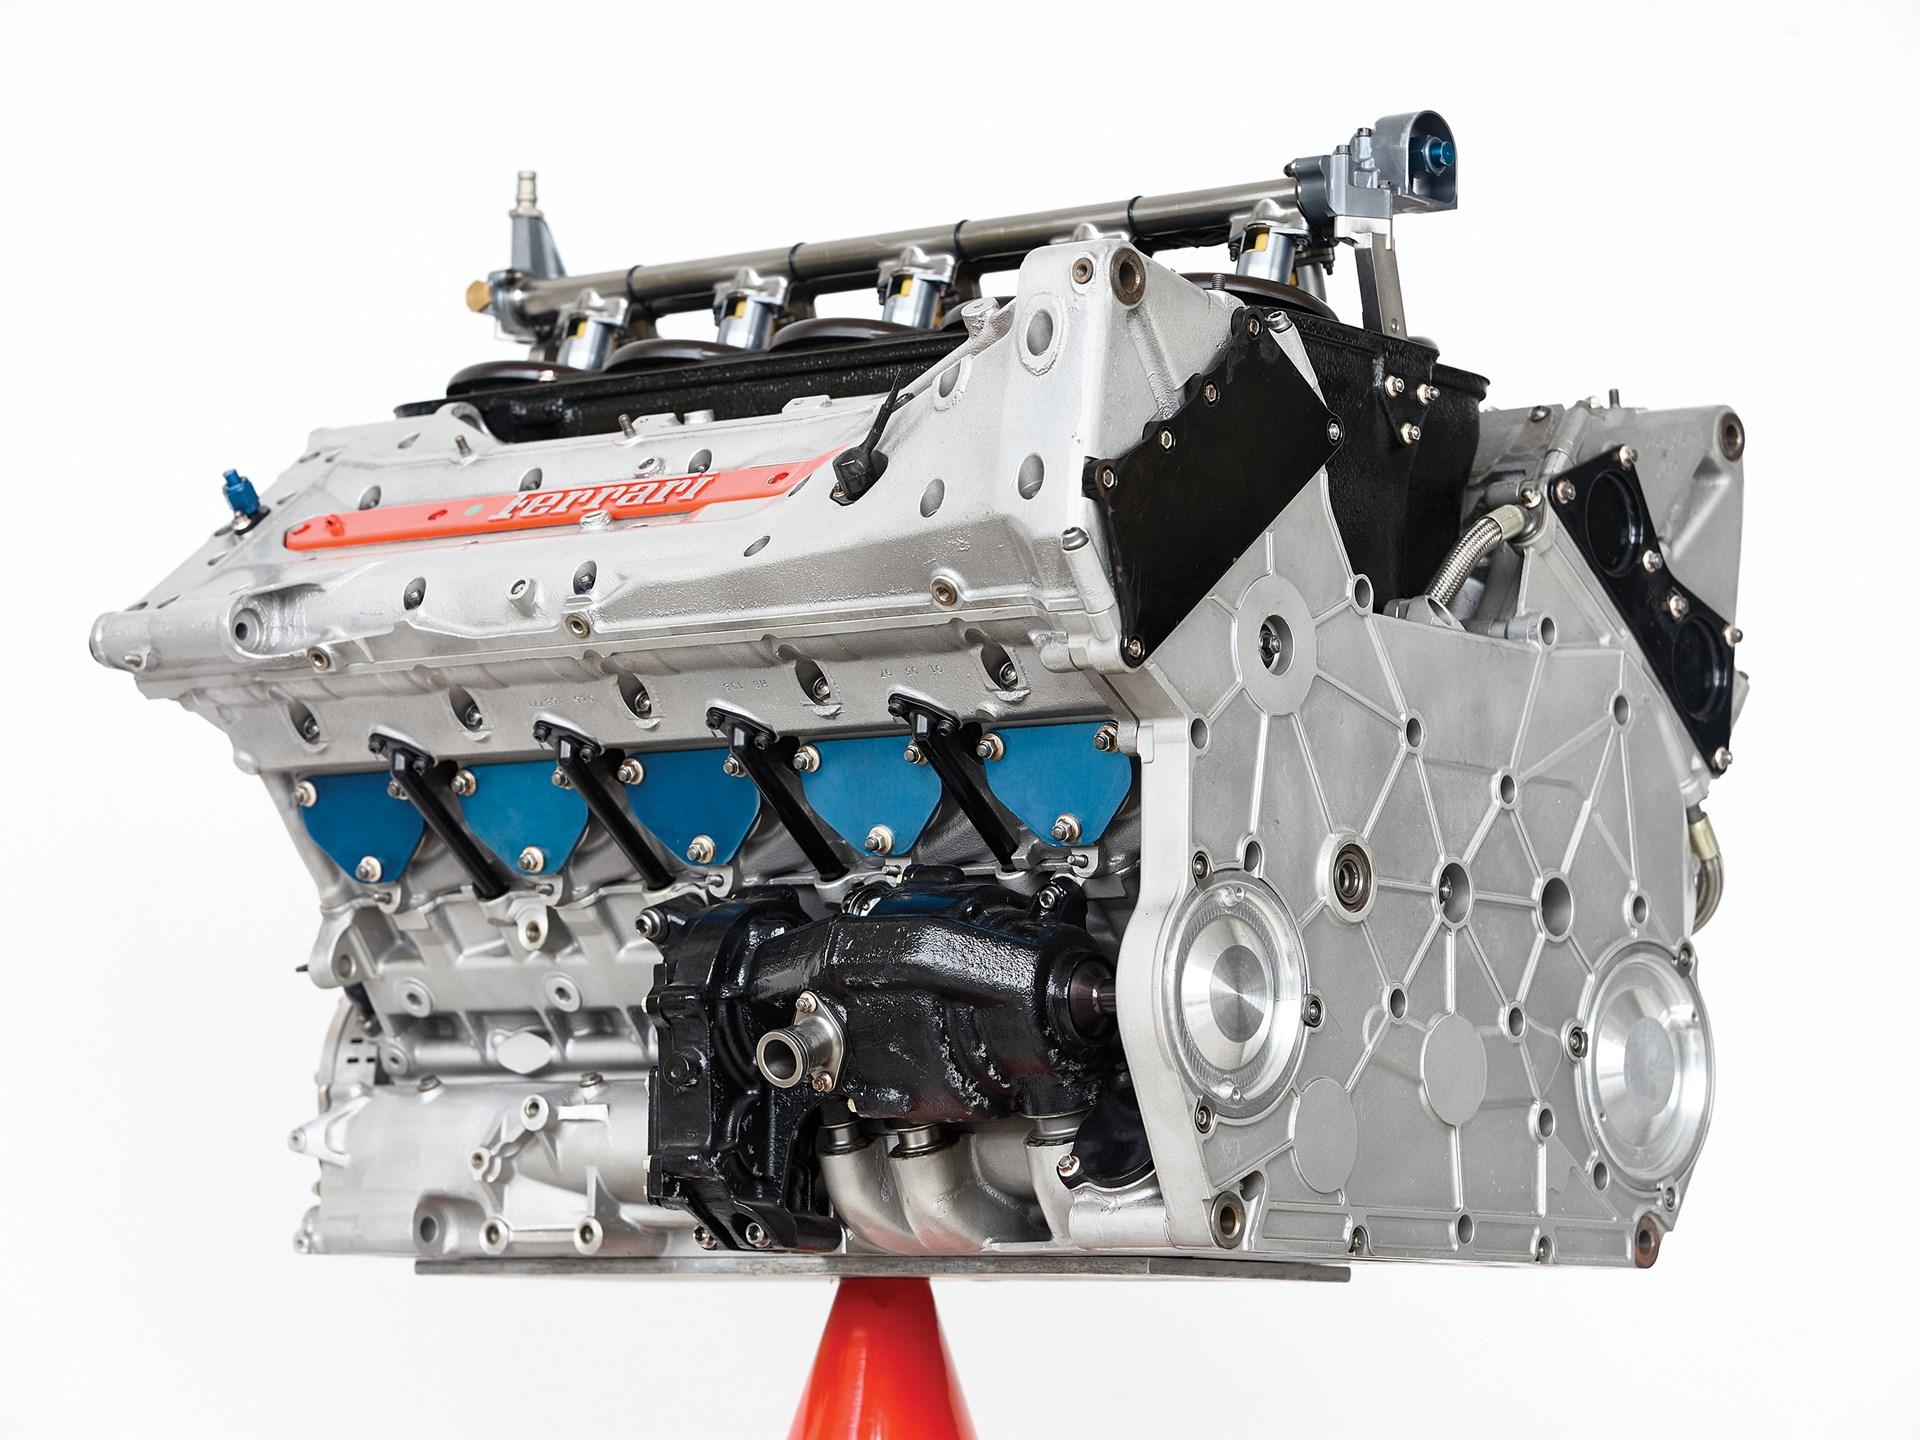 Ferrari F1 046/2 Engine, 1997, No. 354